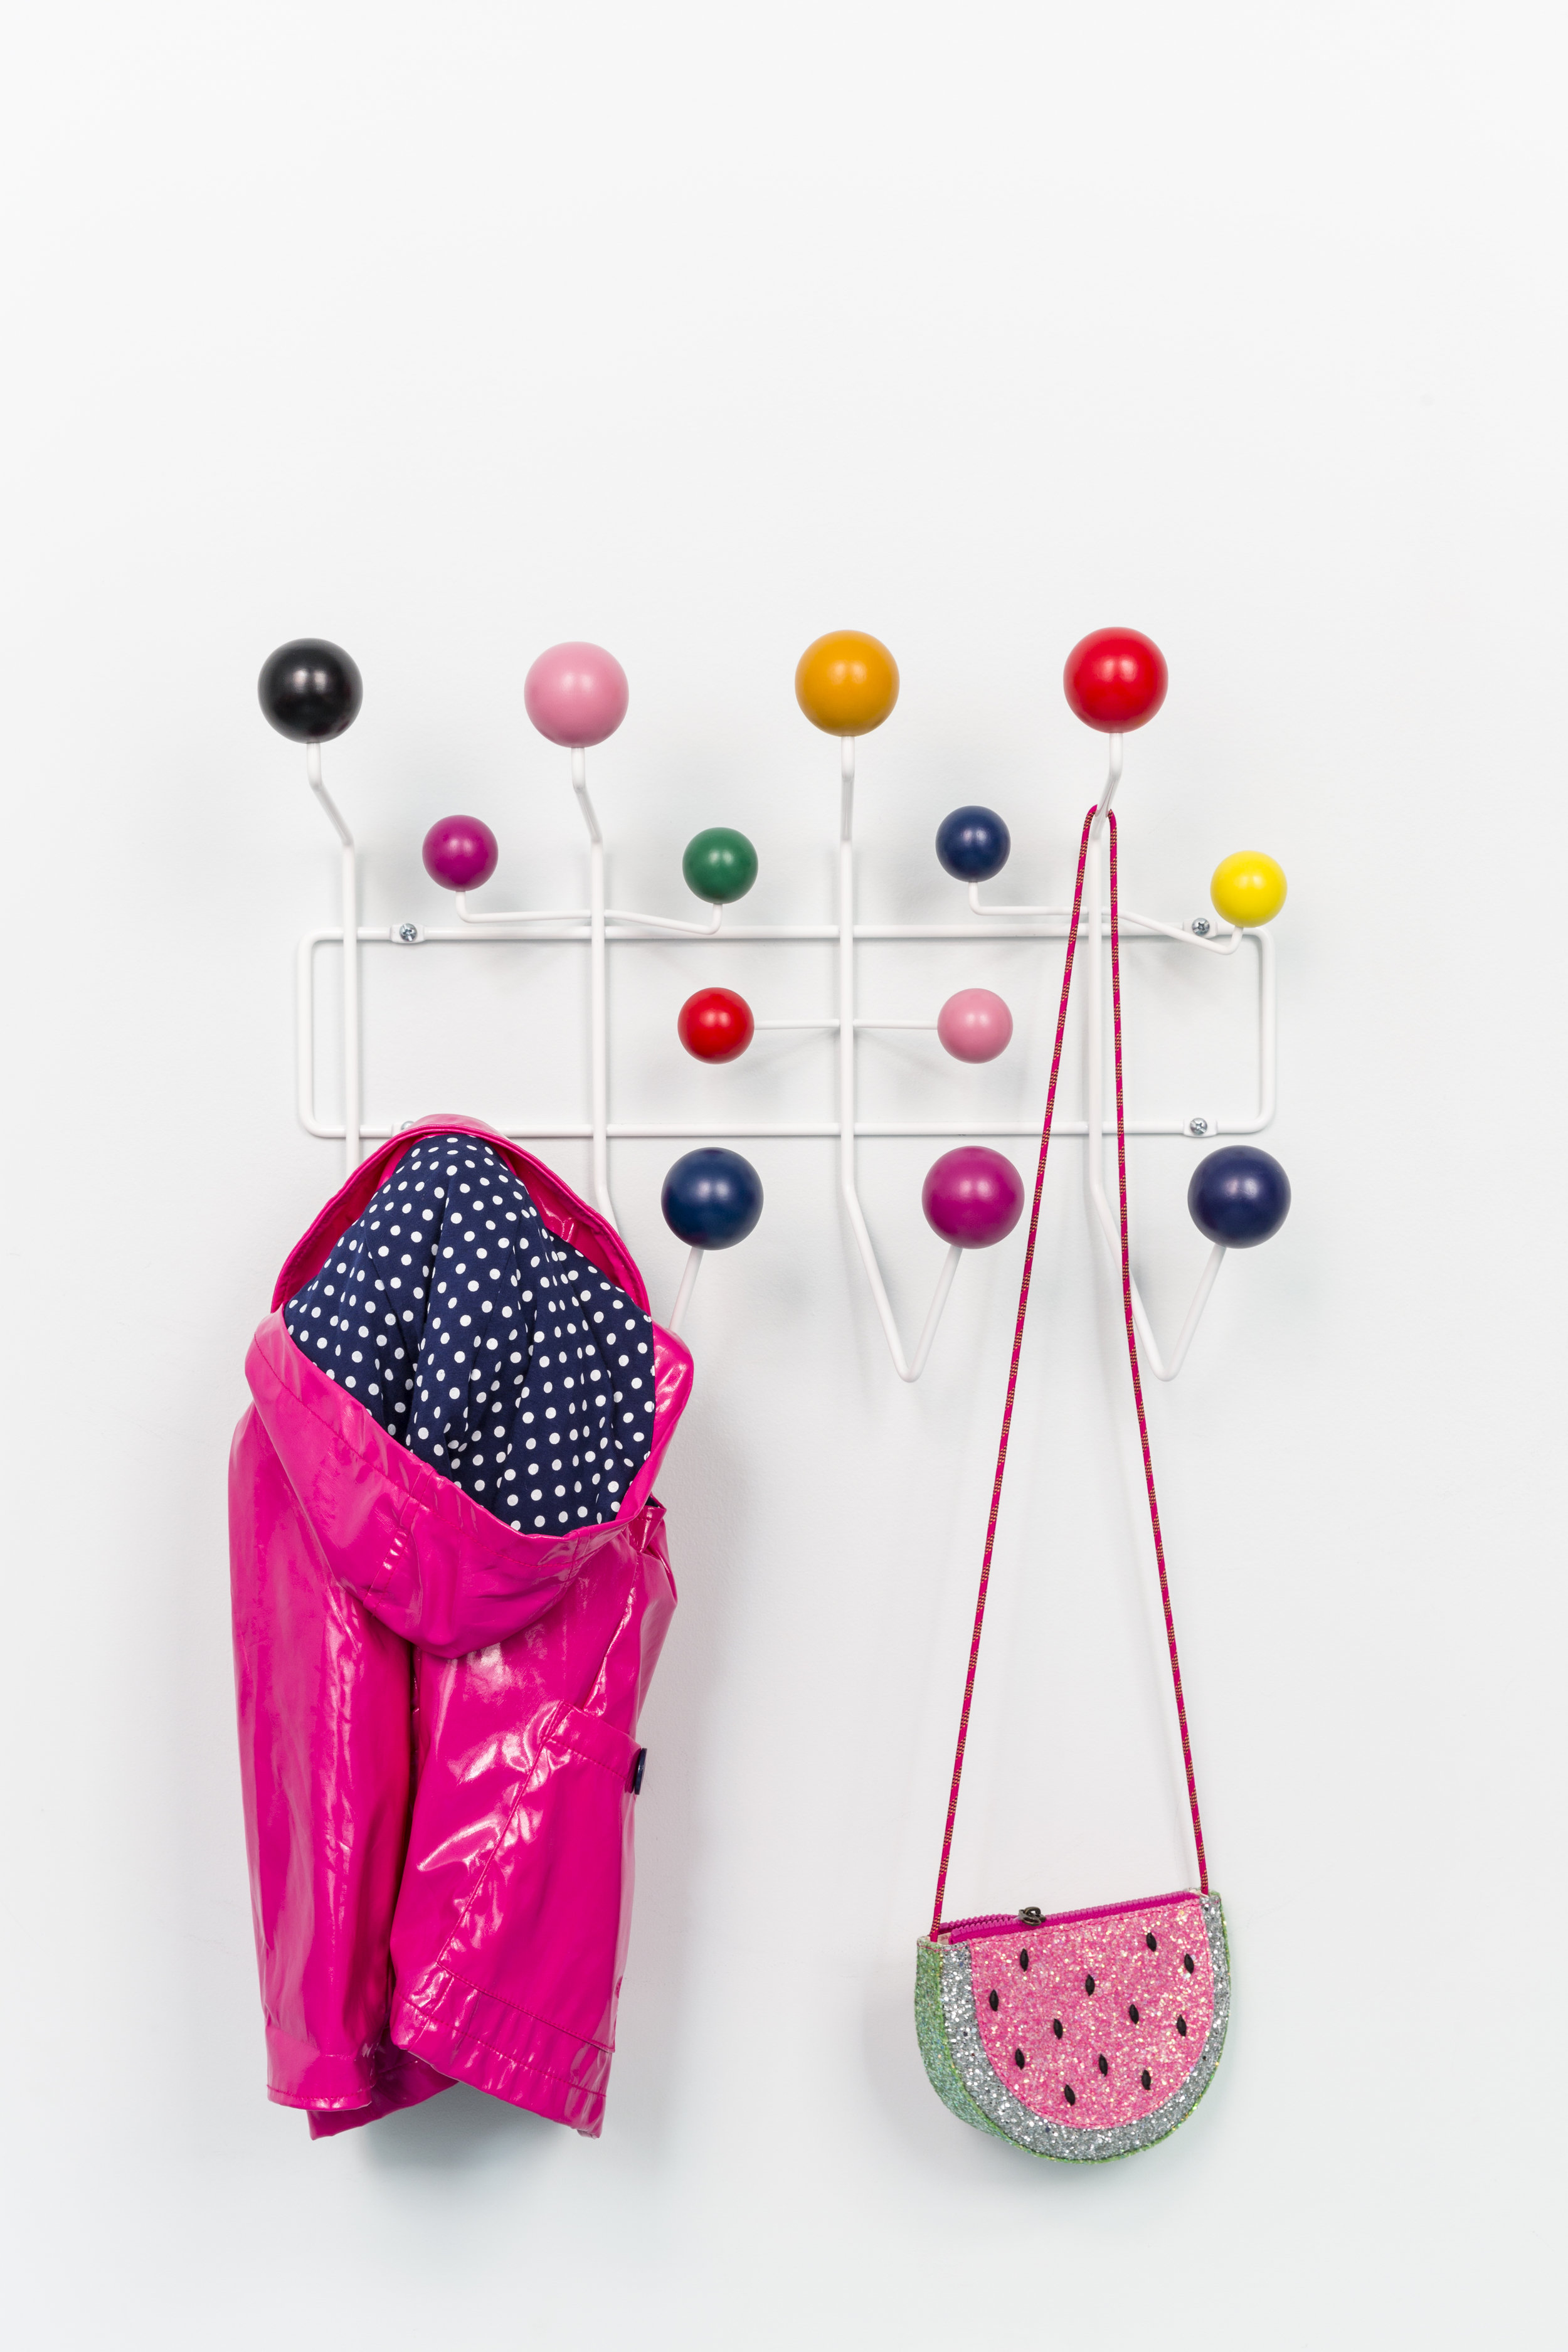 1_Eames Hooks in a playroom.jpg